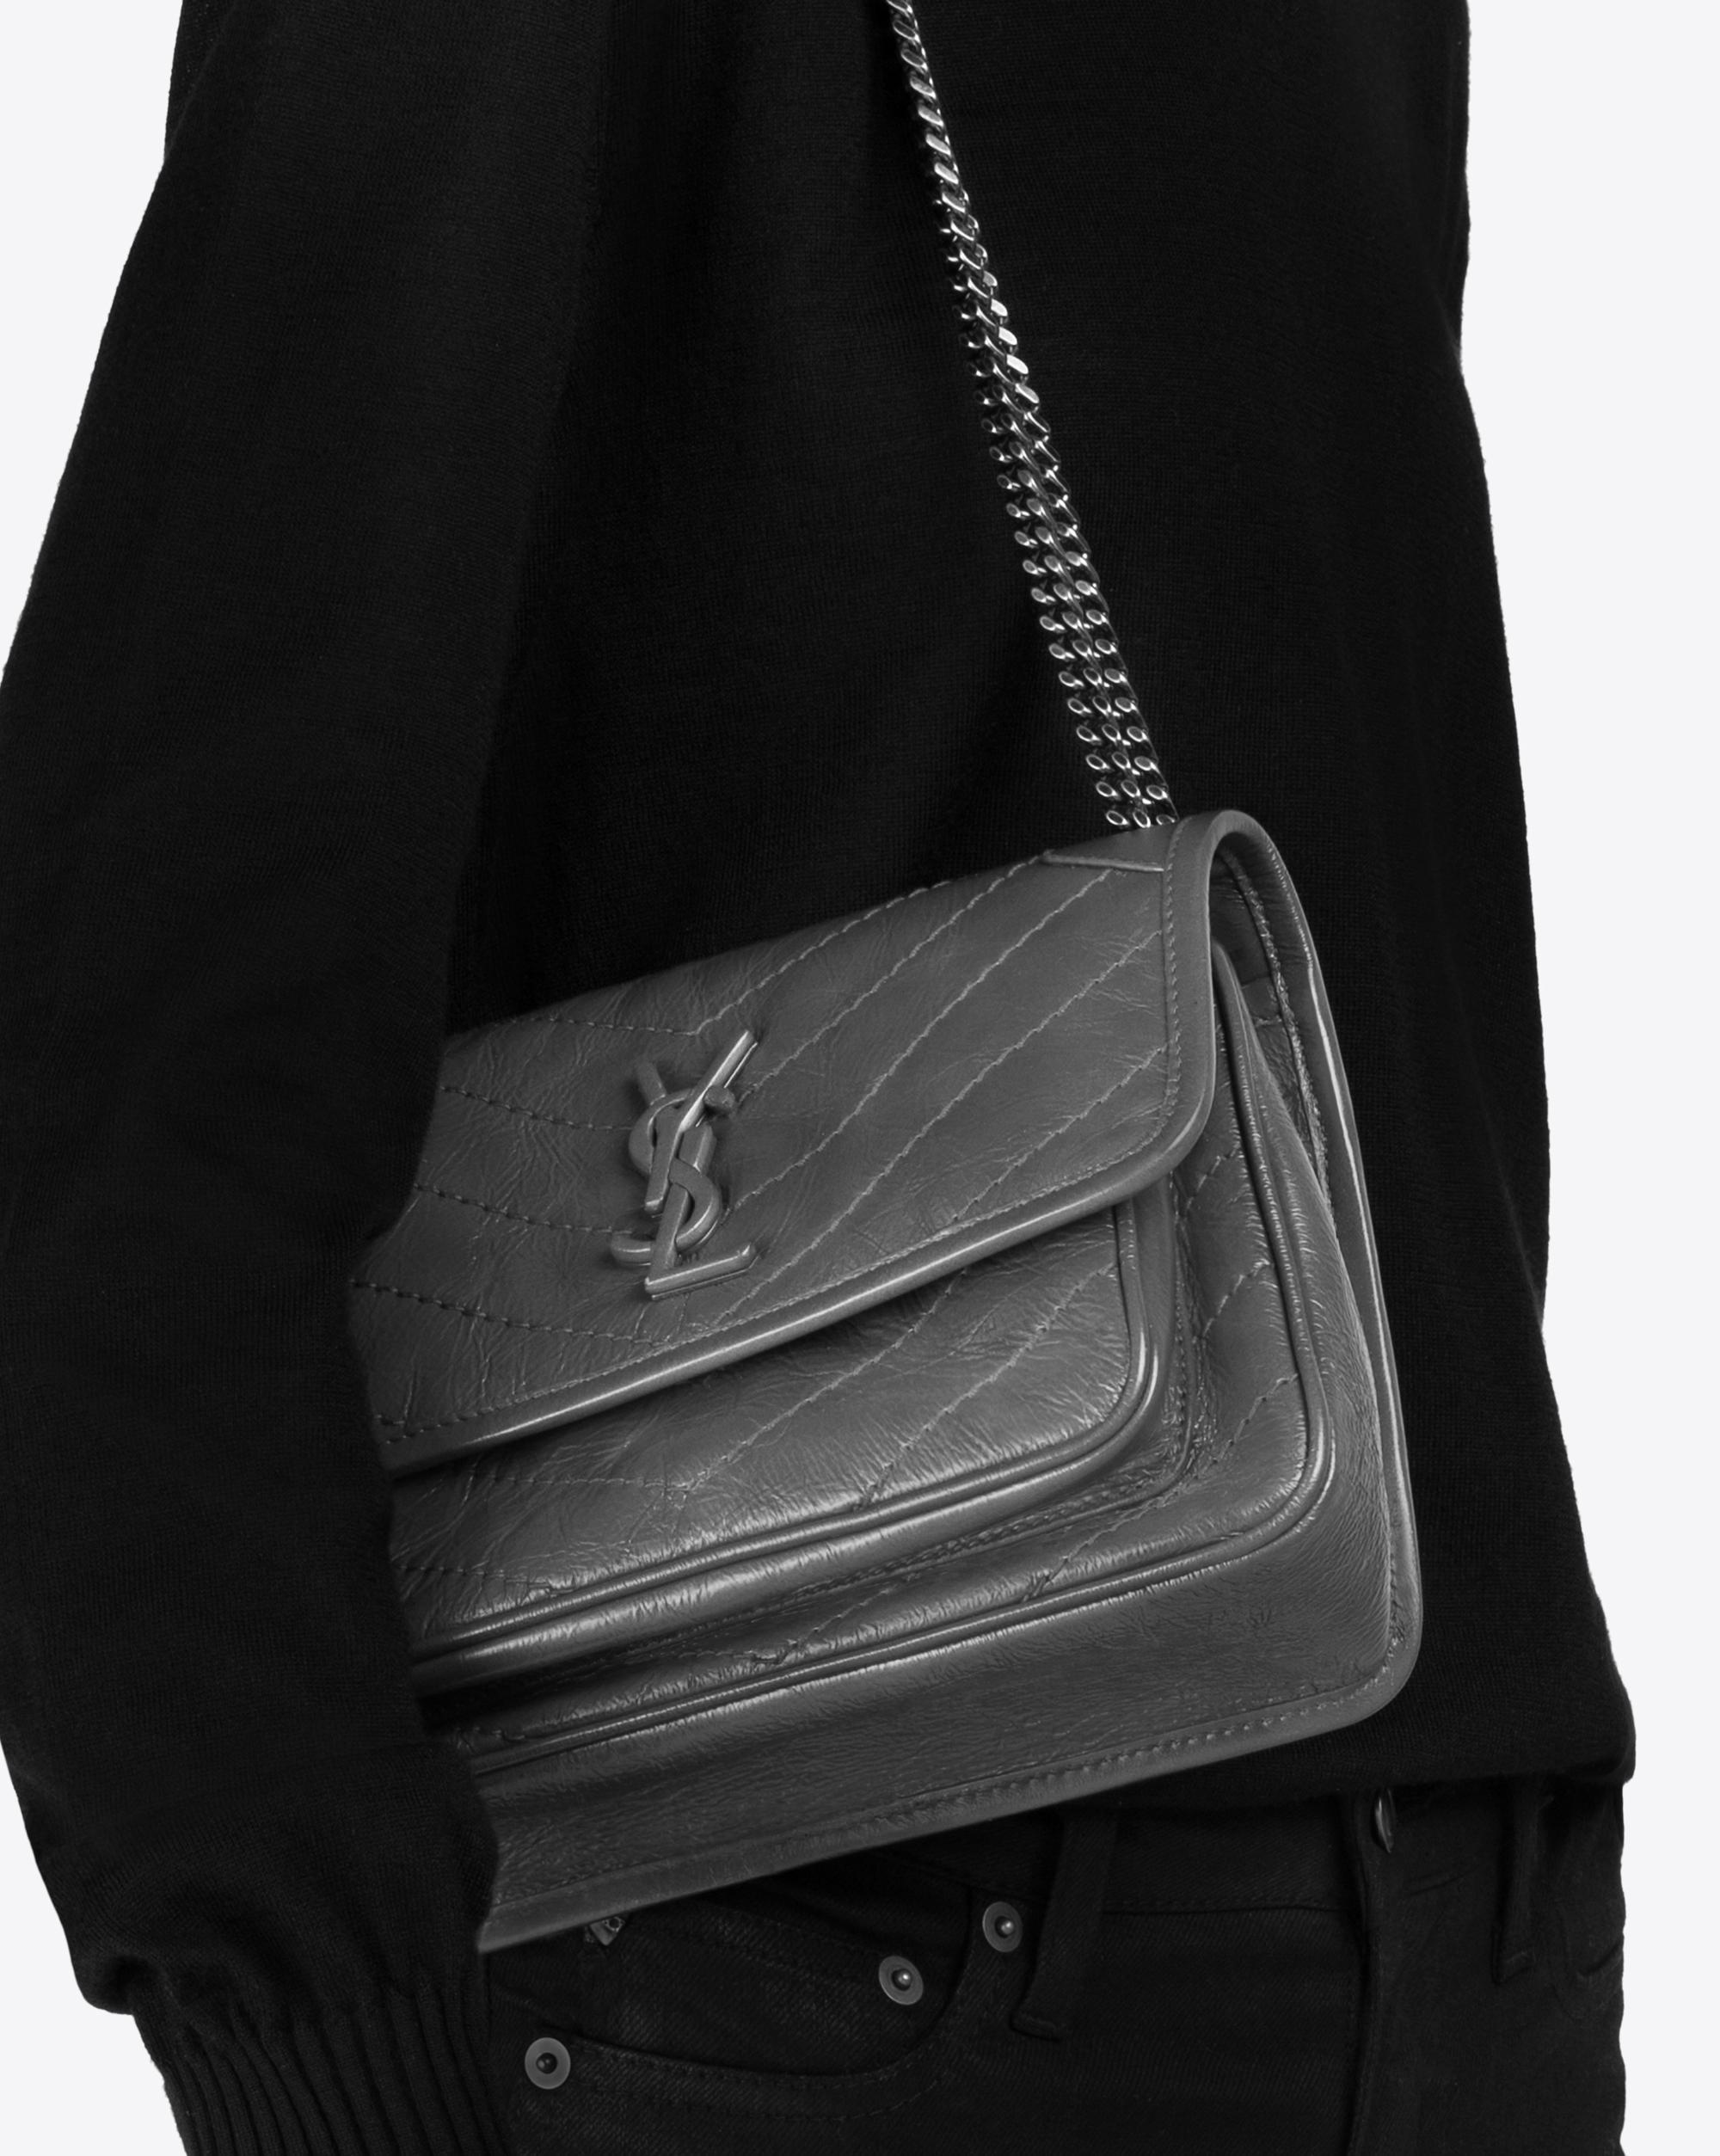 Saint Laurent Niki Baby In Vintage Leather In Brown Lyst